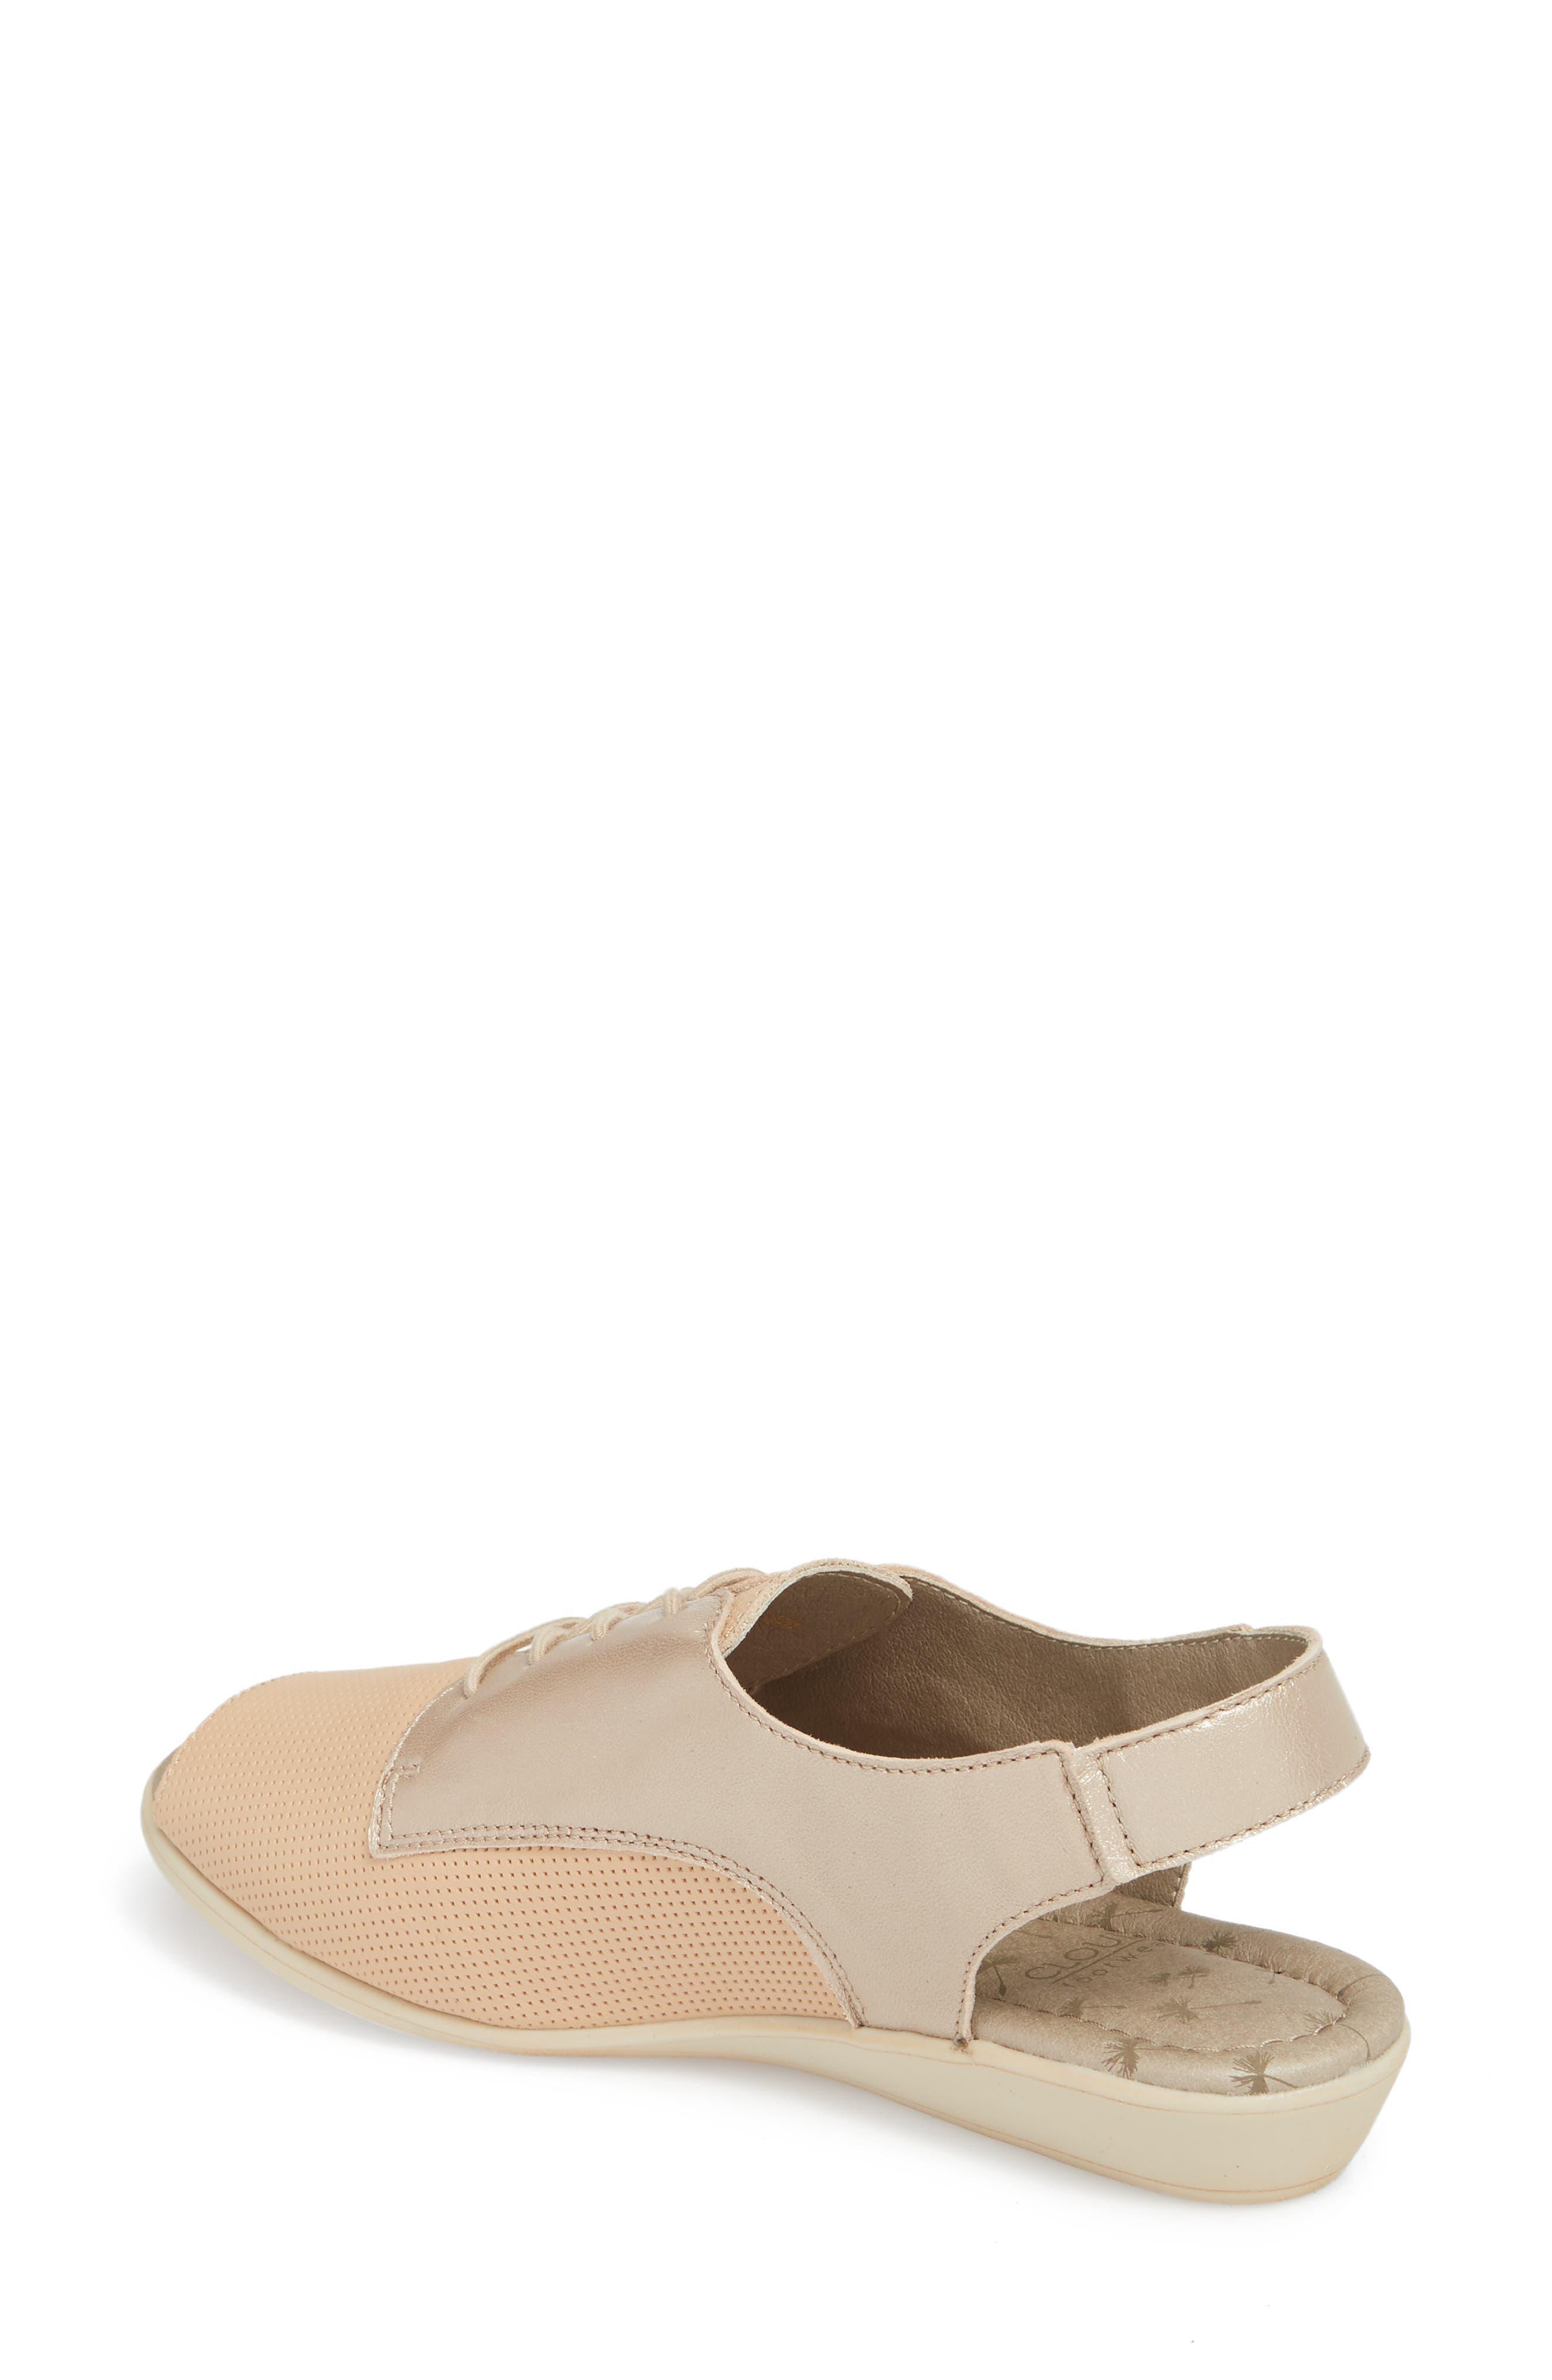 Cleone Slingback Sandal,                             Alternate thumbnail 2, color,                             Puima Sabbia Leather